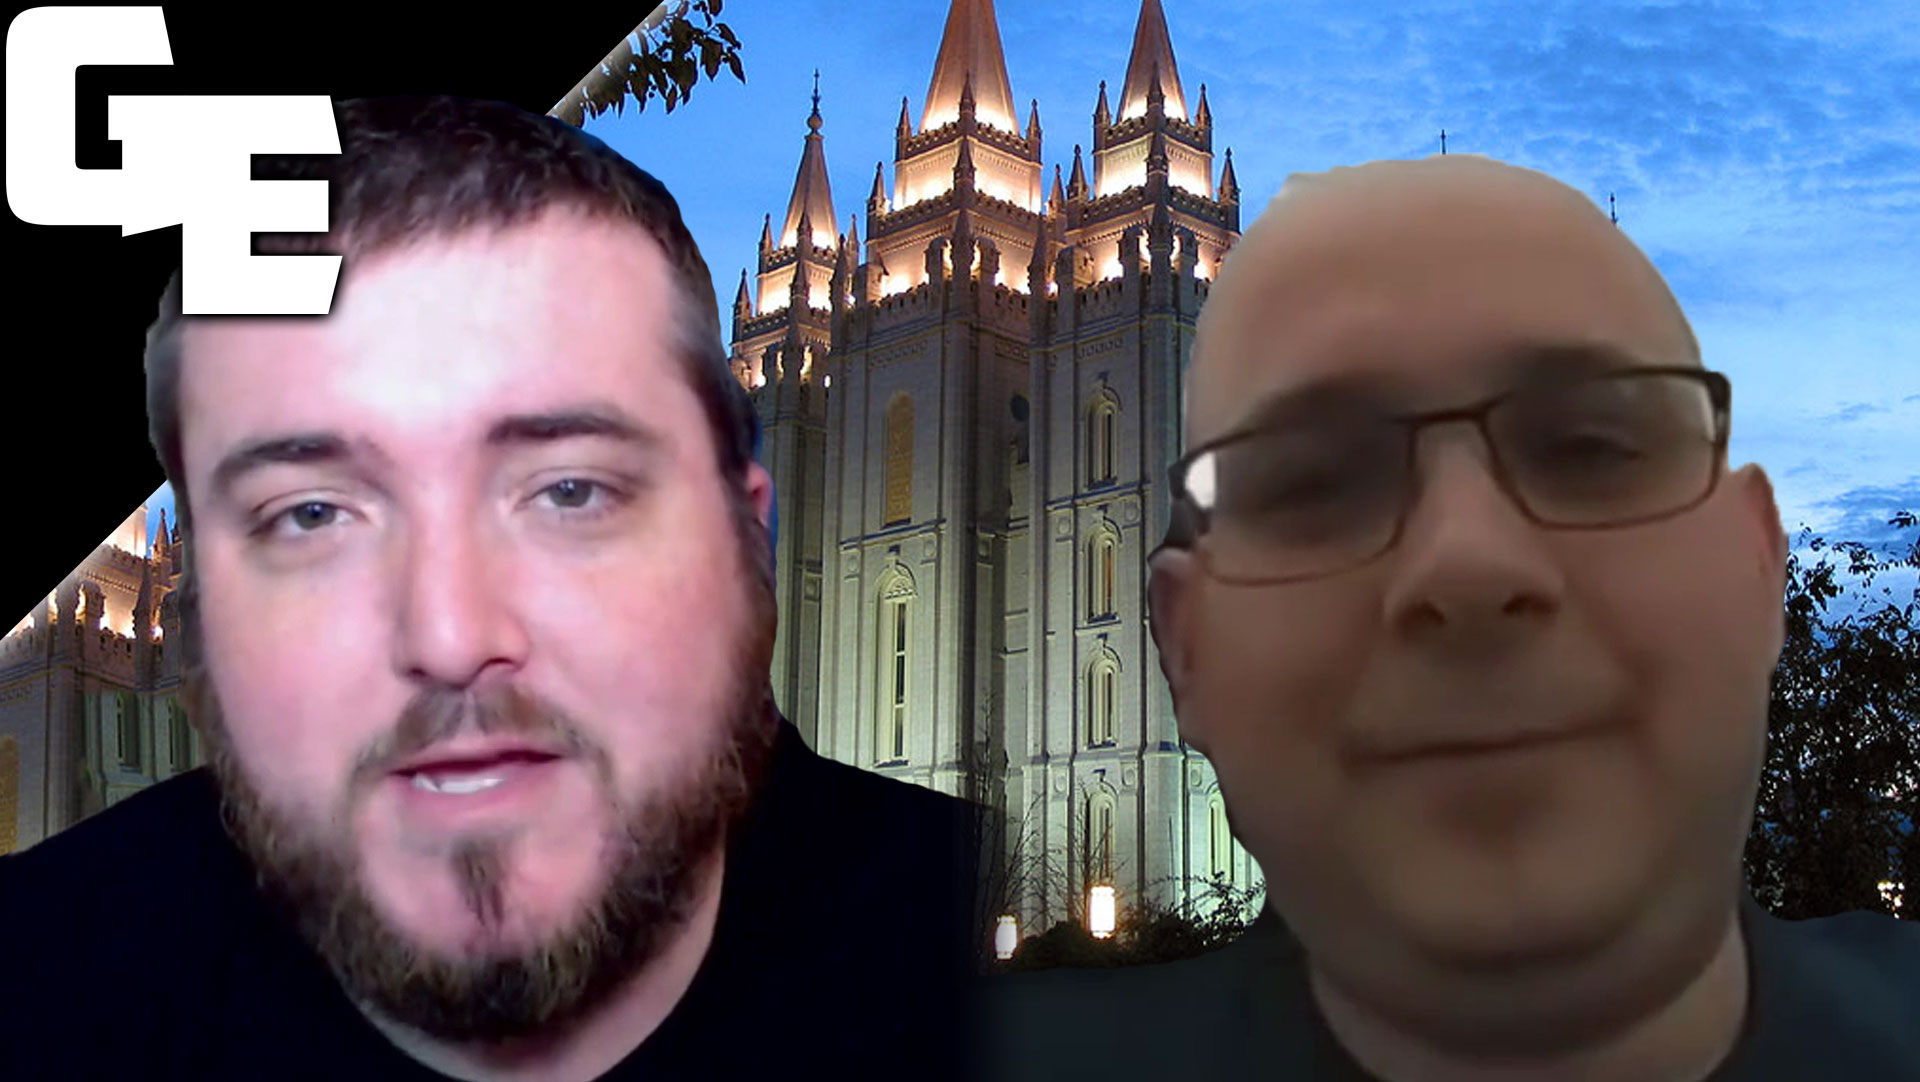 Ex-Mormon Talks Bout His Abusive Religious Past